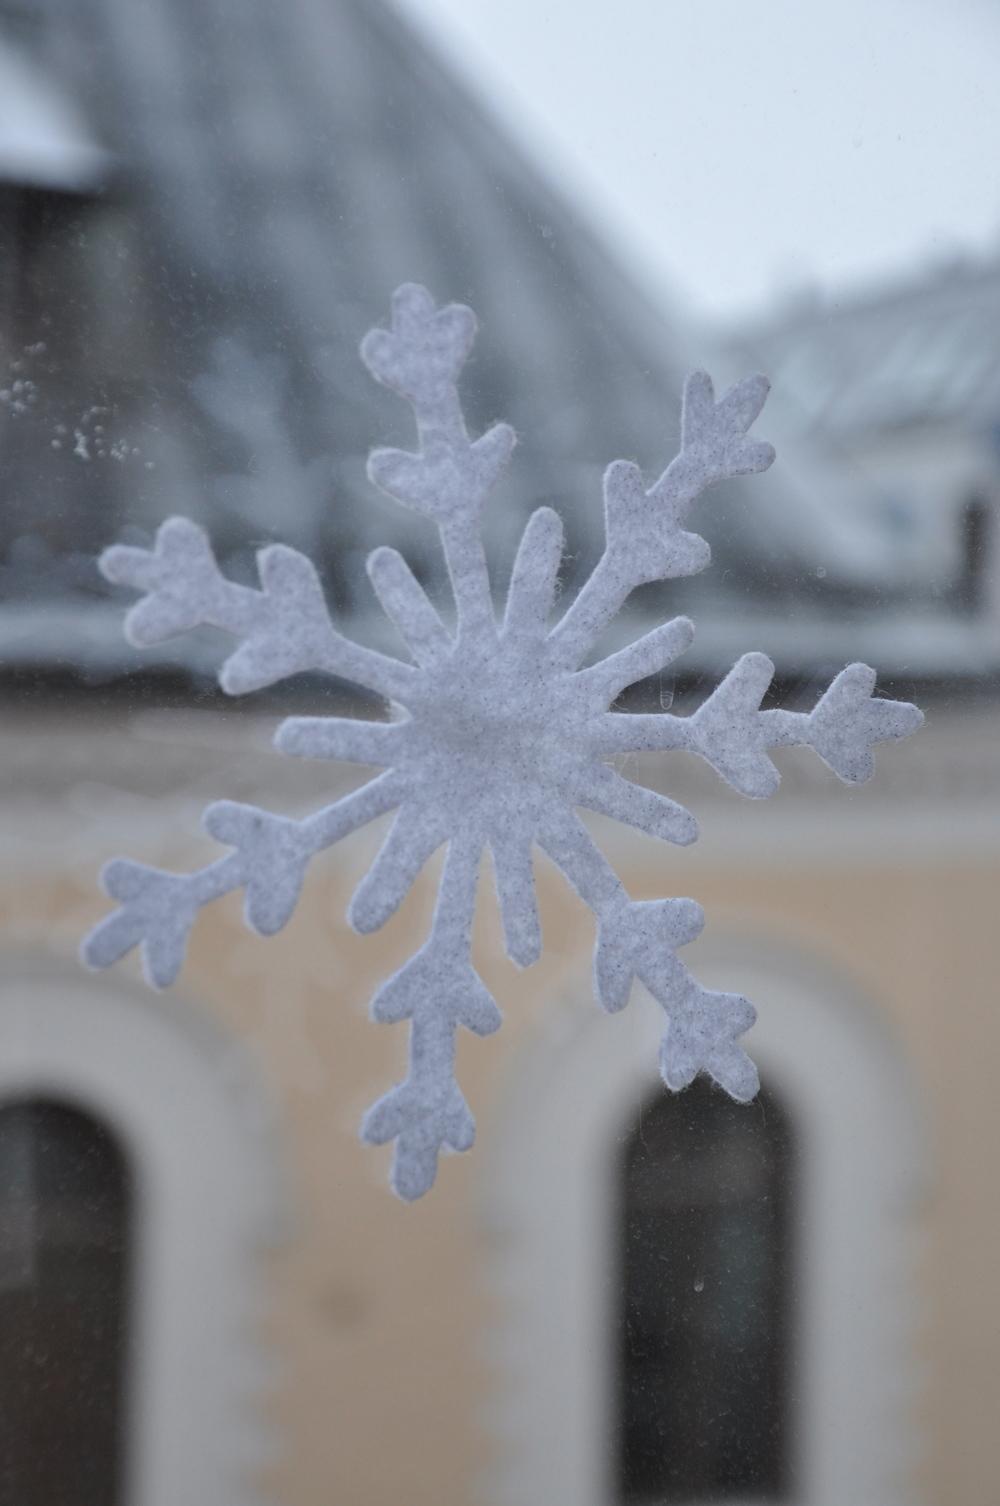 Hemgjorda snöstjärnor i filt ökar mysetinne!   Foto:  Palatsliv